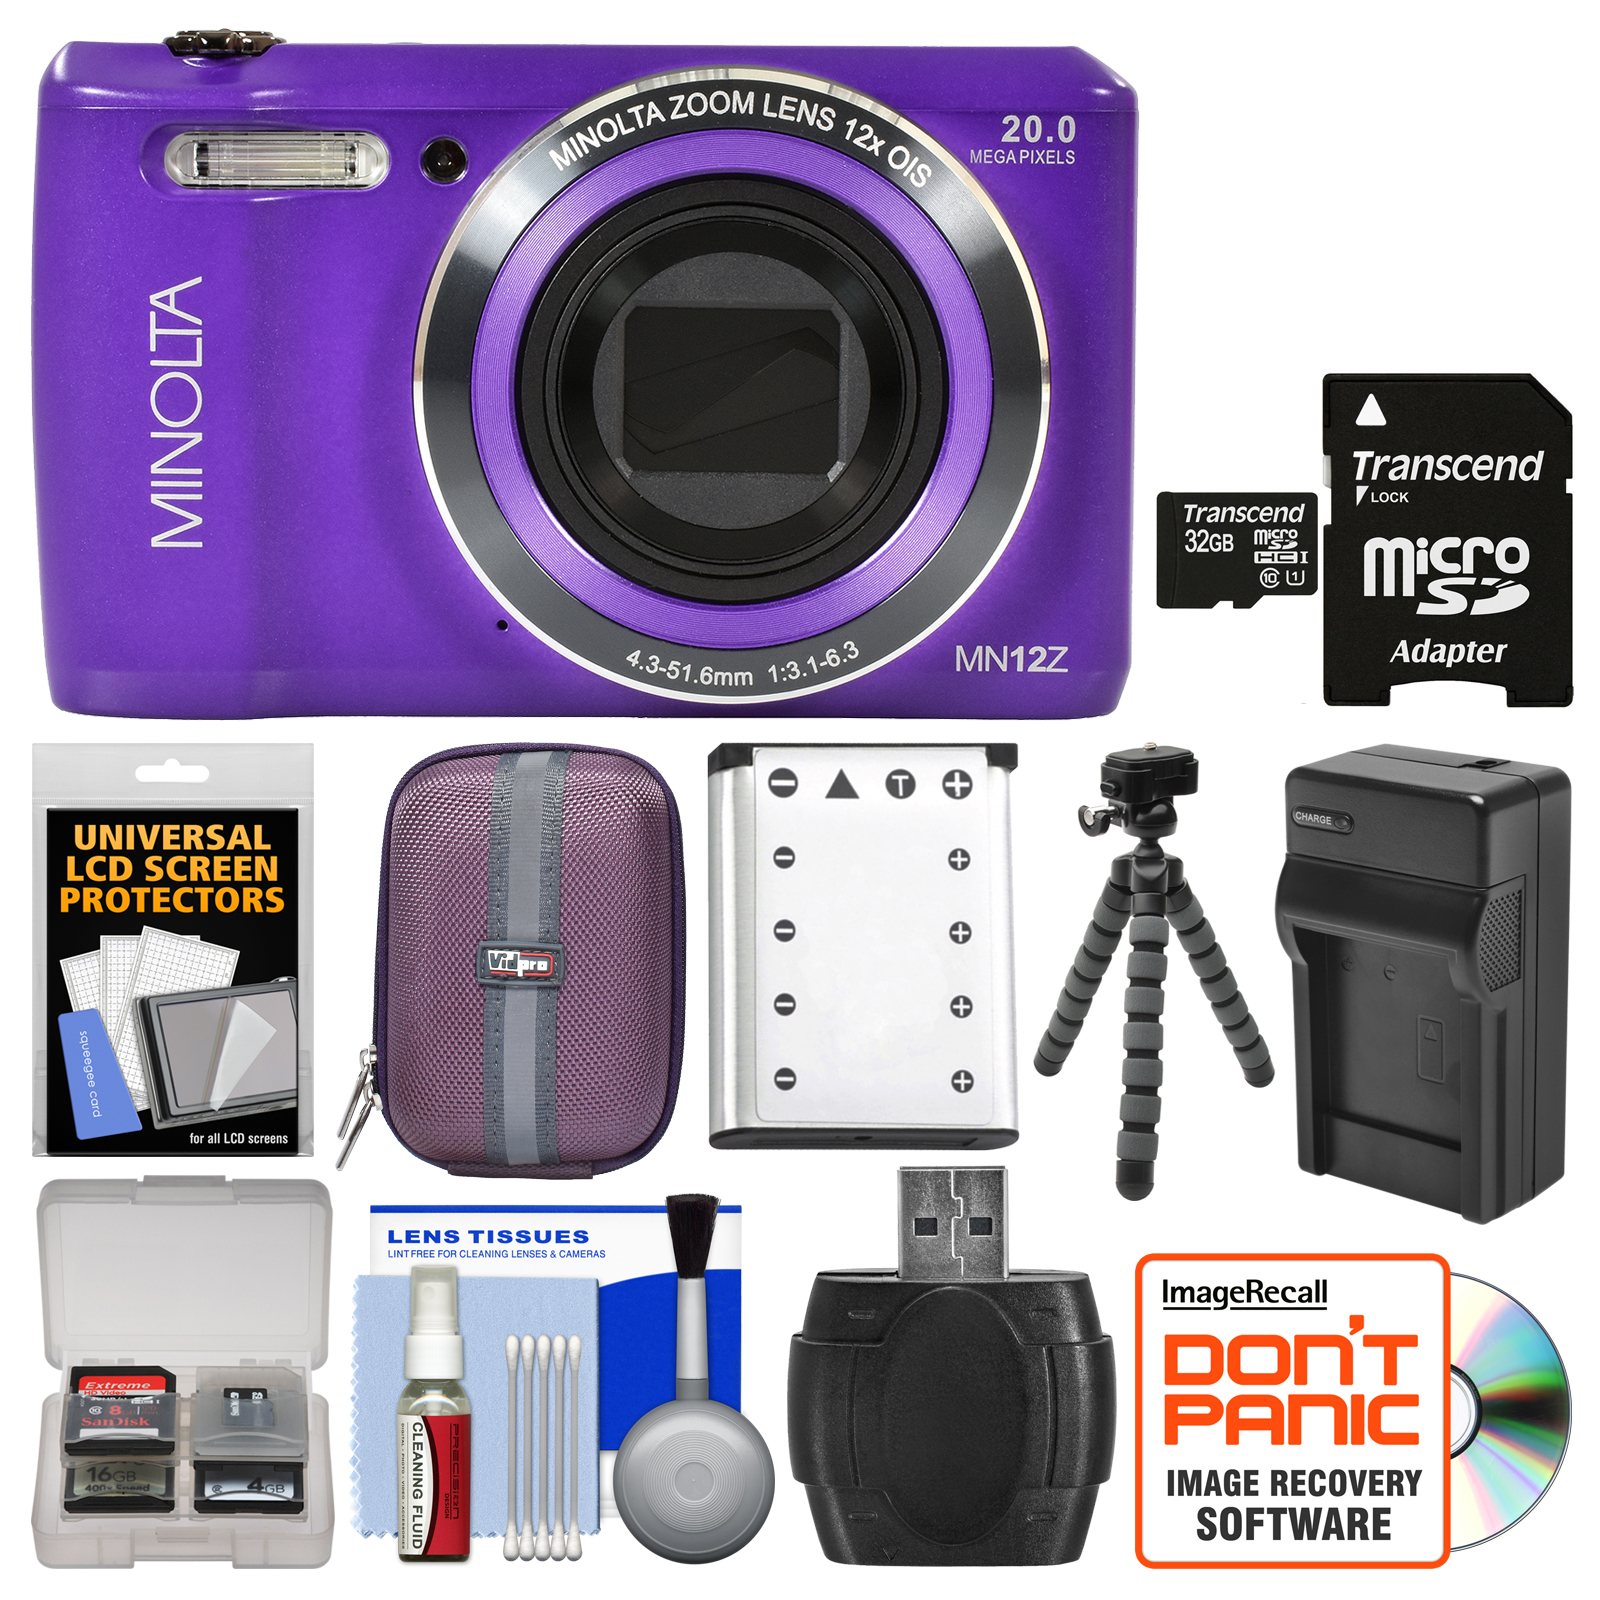 Konica Minolta MN12Z OIS 12x Zoom Wi-Fi Digital Camera (P...